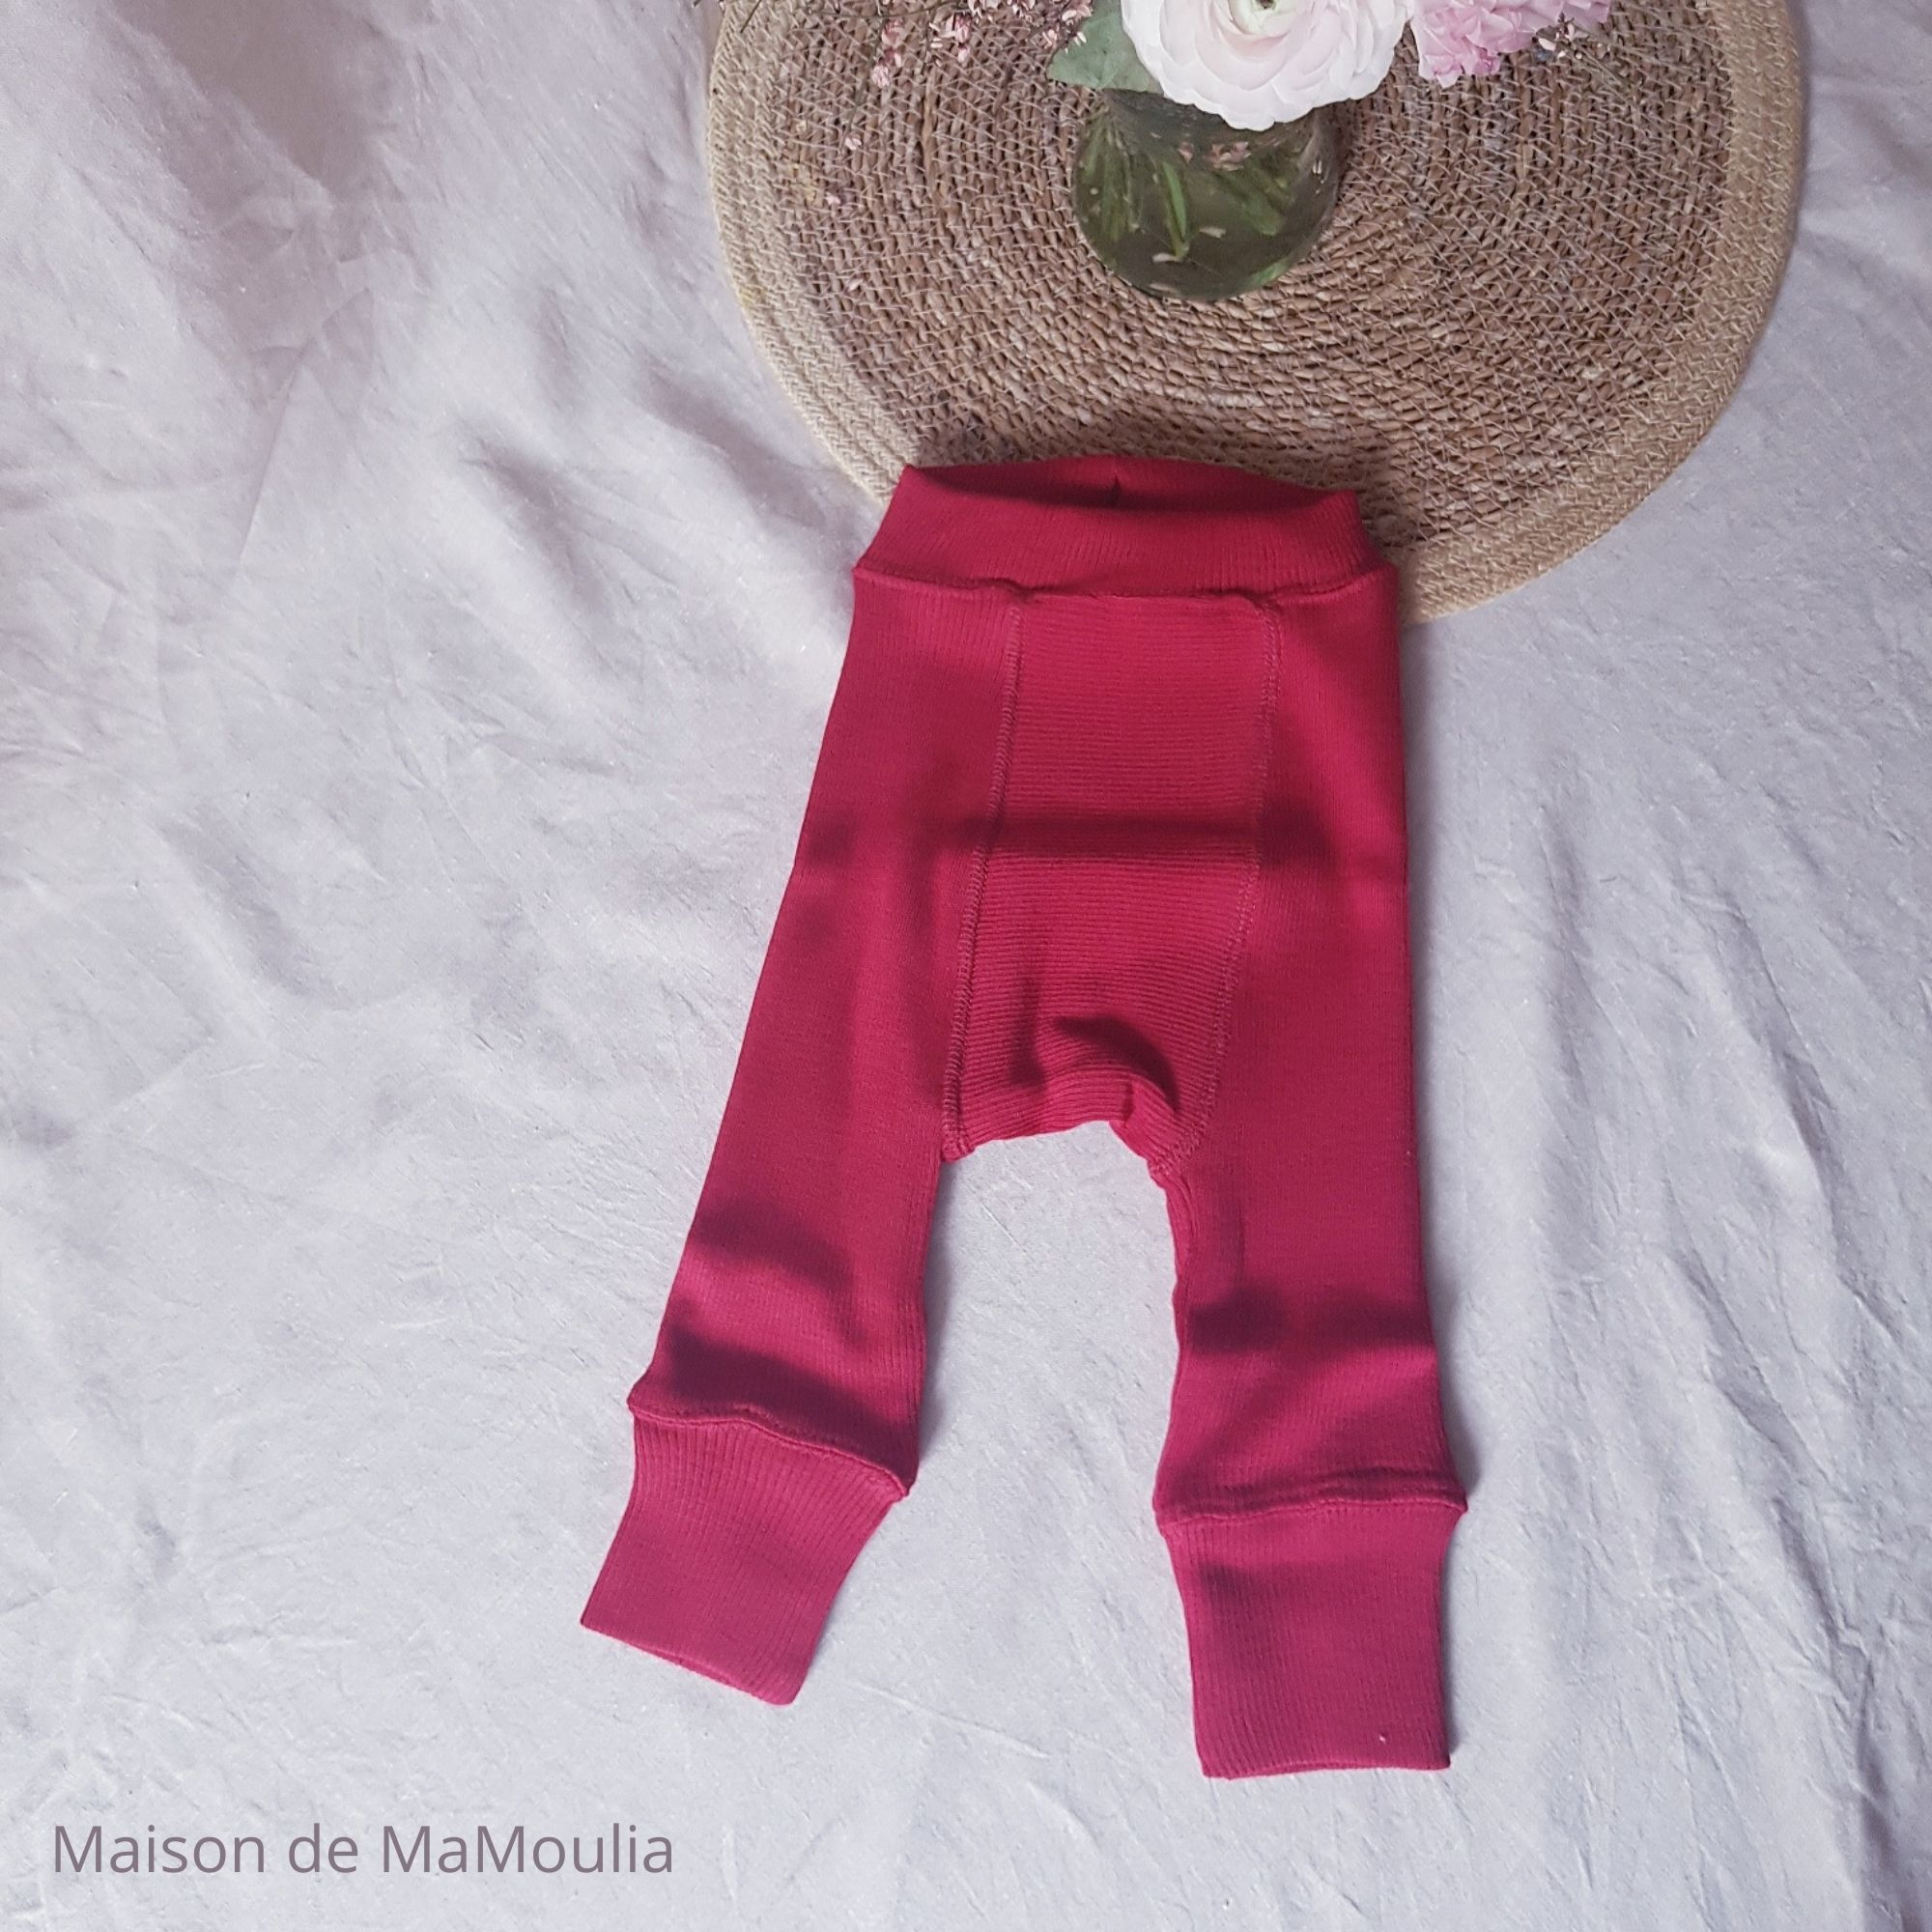 MANYMONTHS - LONGIES Pantalon Évolutif - 100% laine mérinos - Réversible - CRANBERRY/CORAL